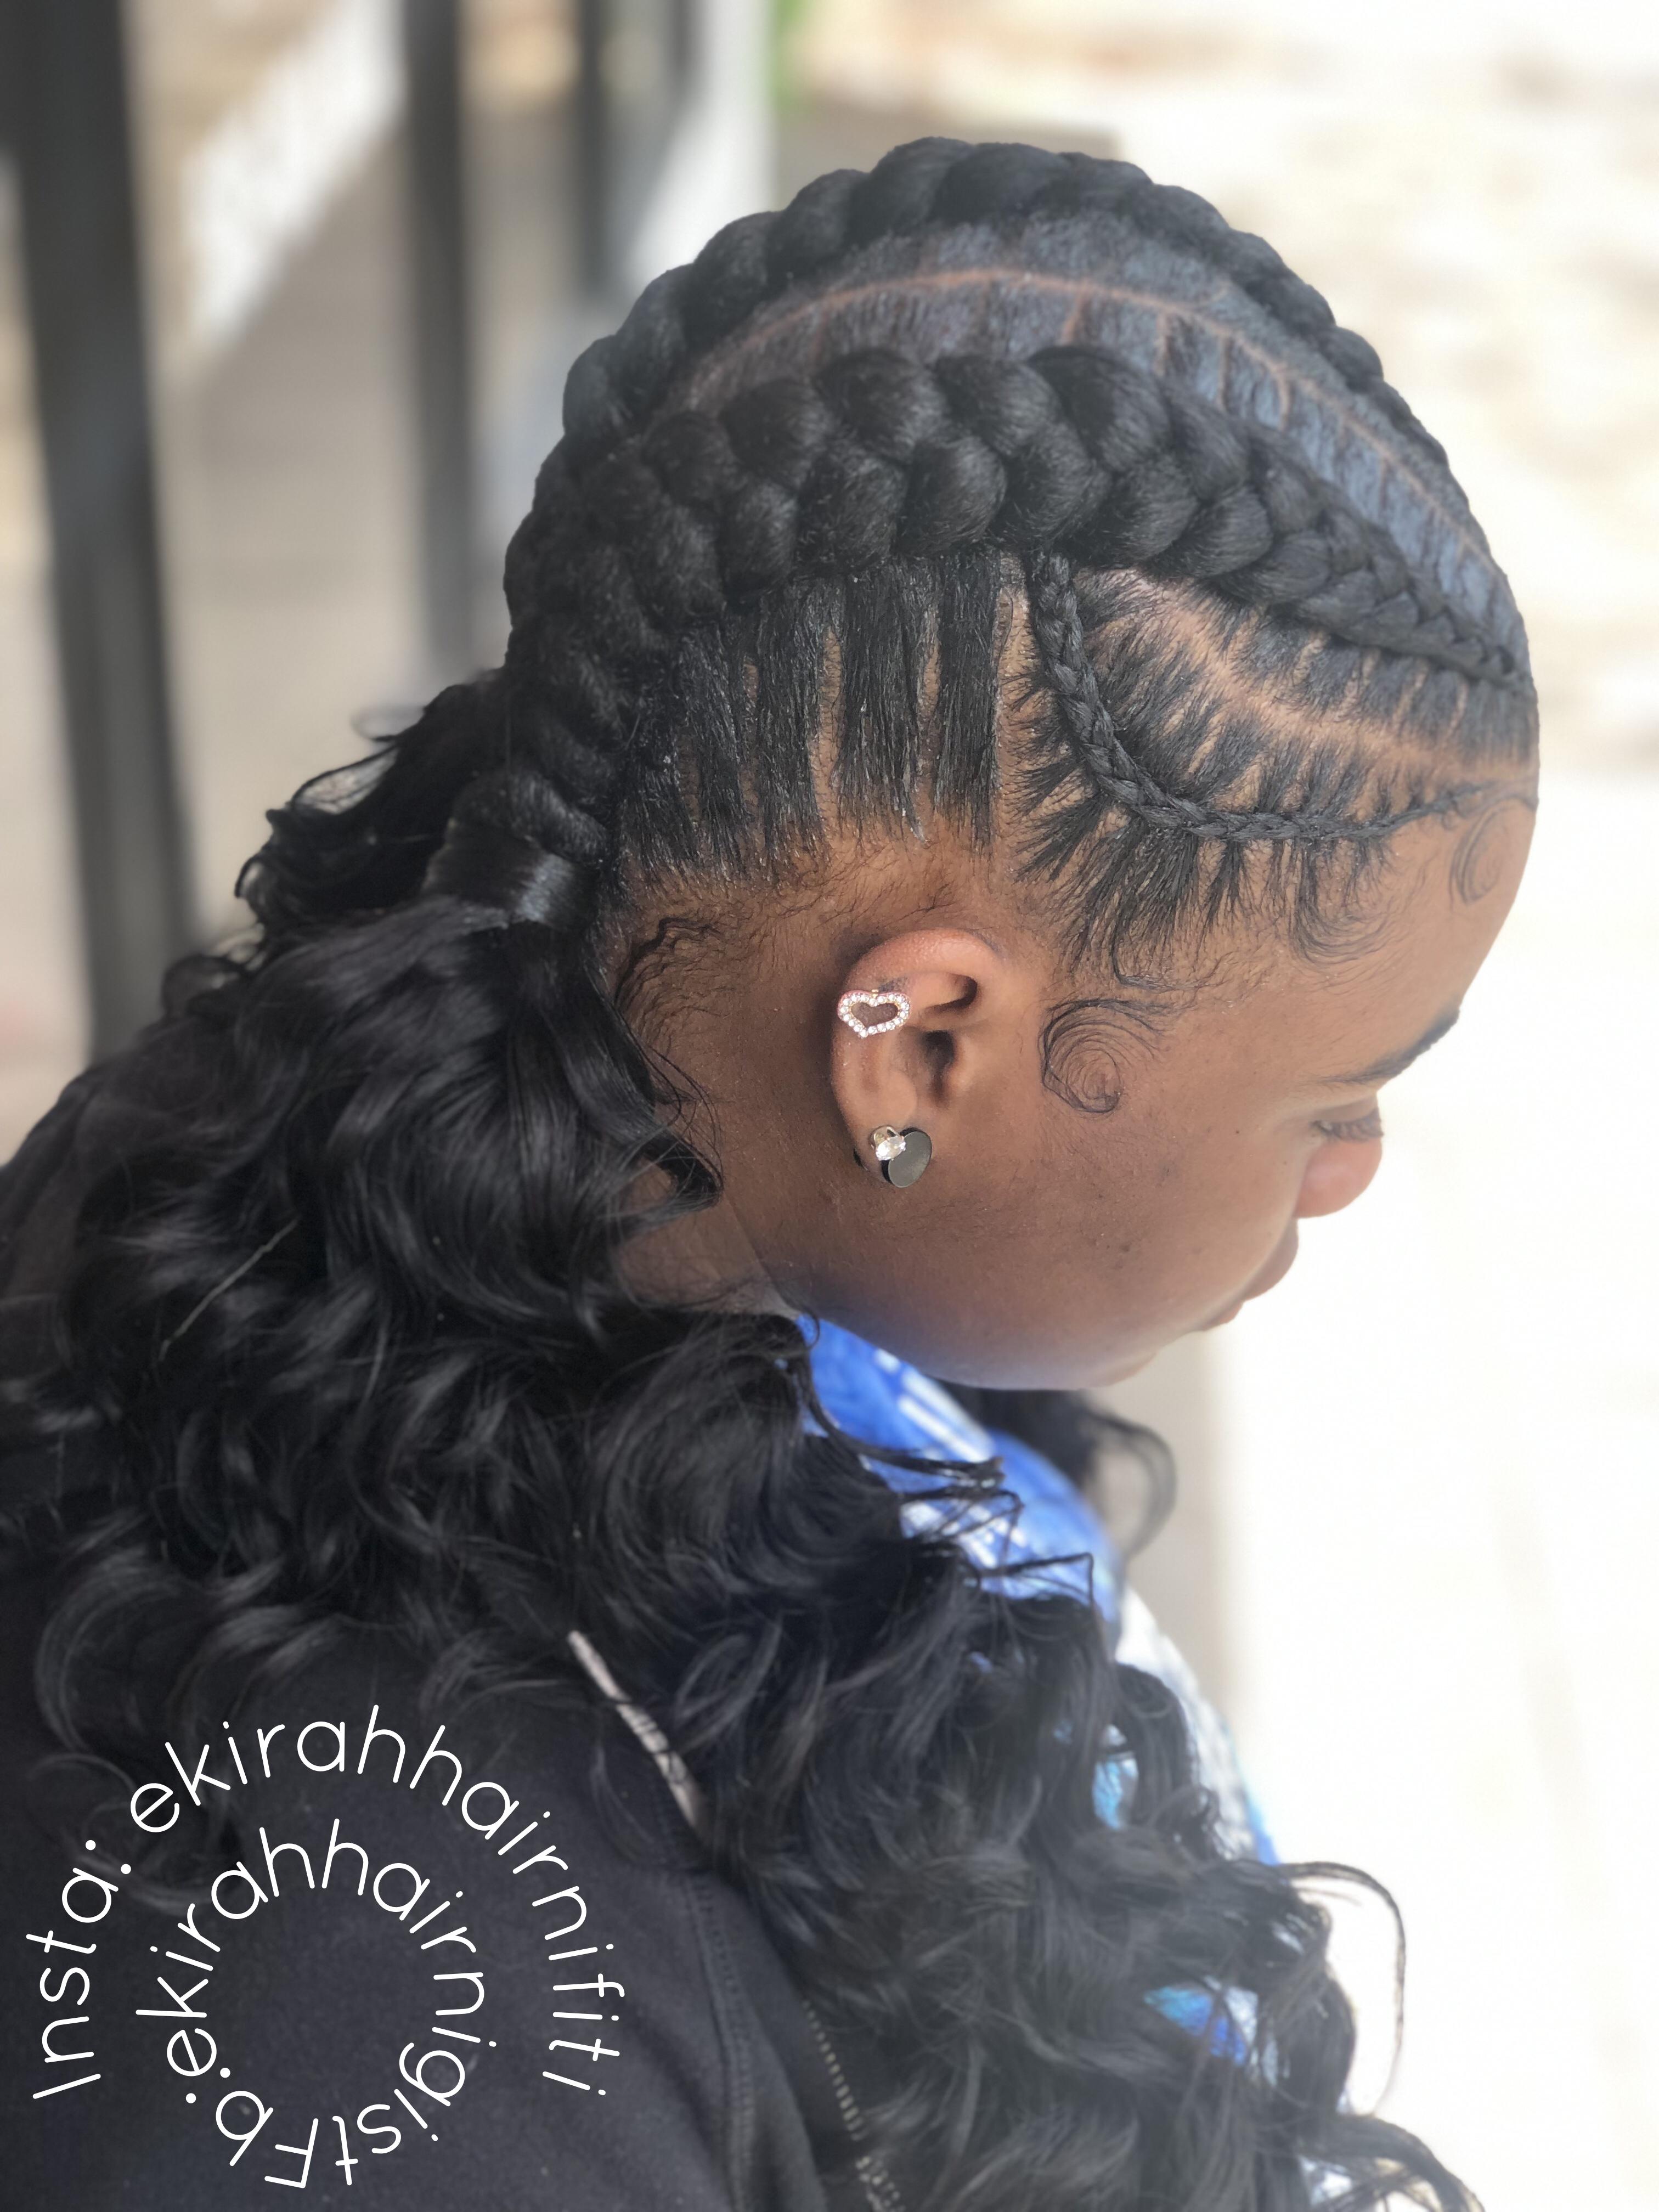 Pin By Menk On Kids Black Hair Hair Styles Braided Hairstyles Natural Hair Styles